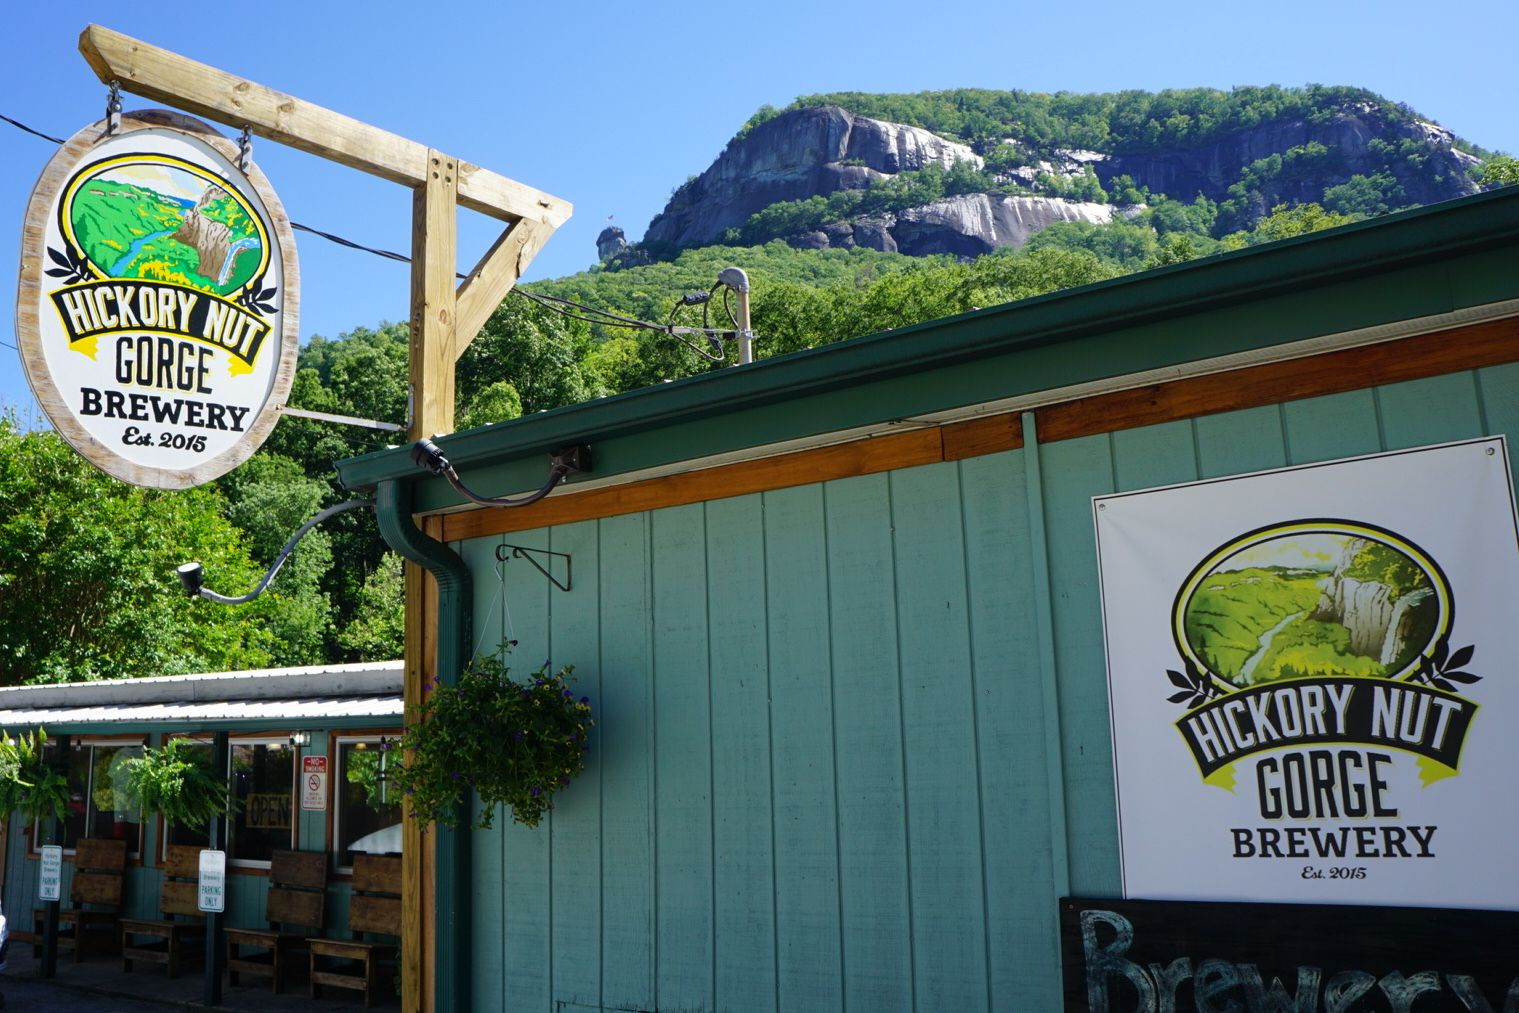 Hickory Nut Gorge Brewery in Chimney Rock, Nc | Landscape Design ...